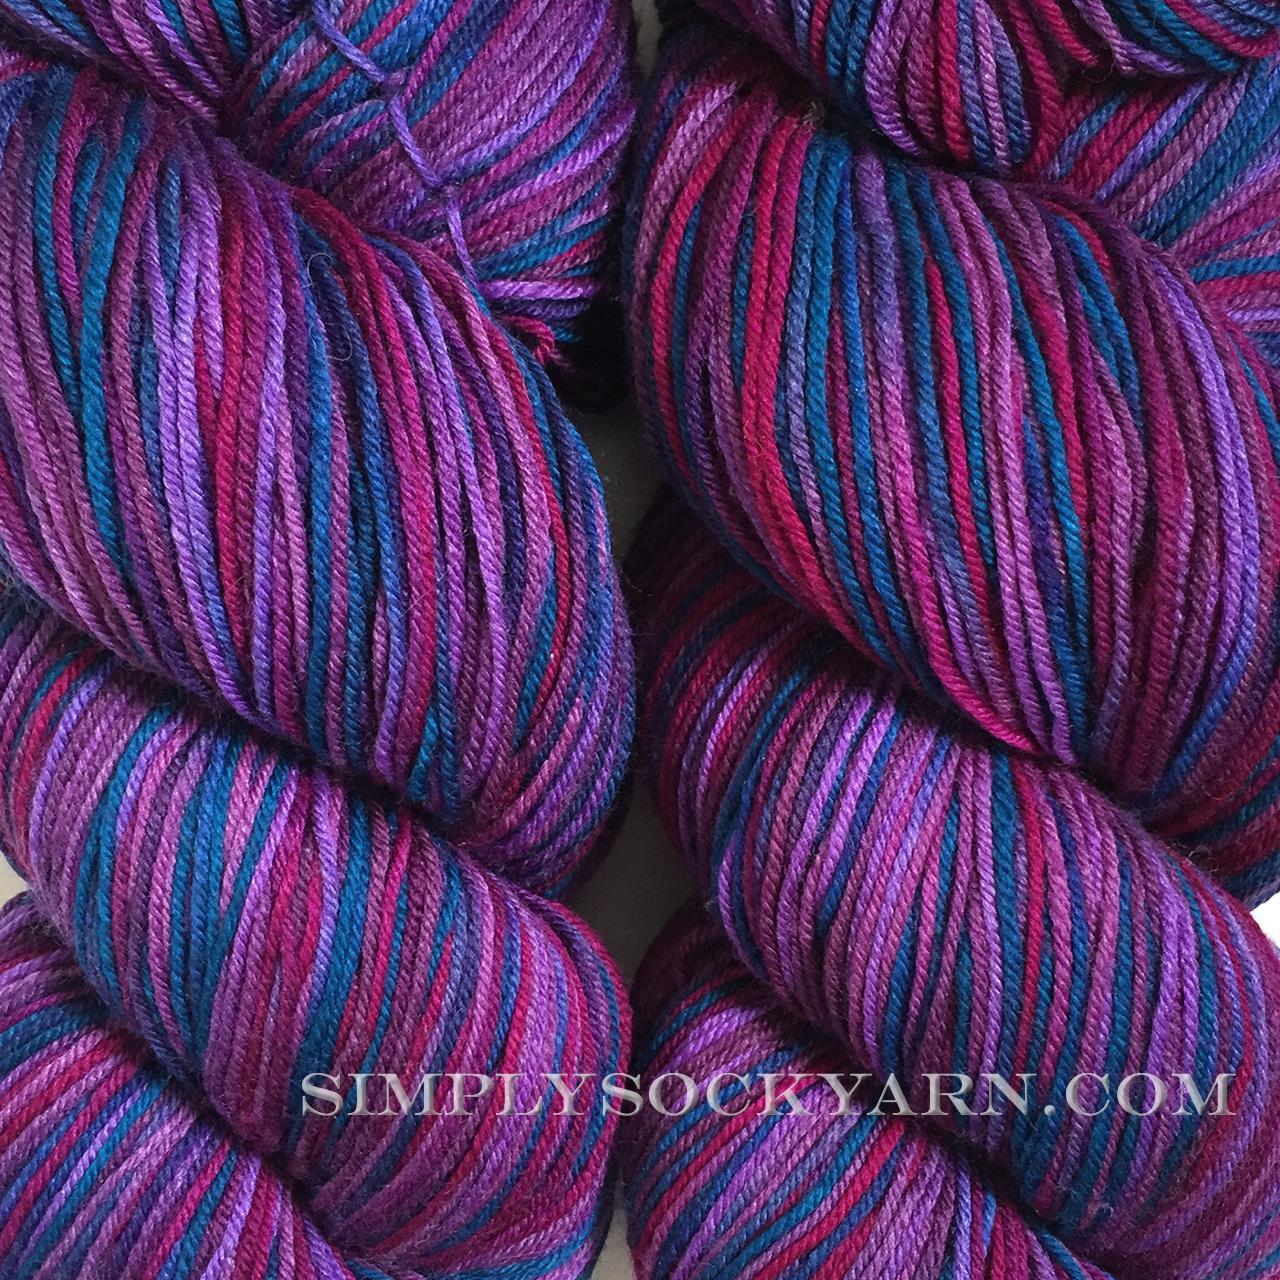 CY Heritage Silk Pts 9995 Viole -